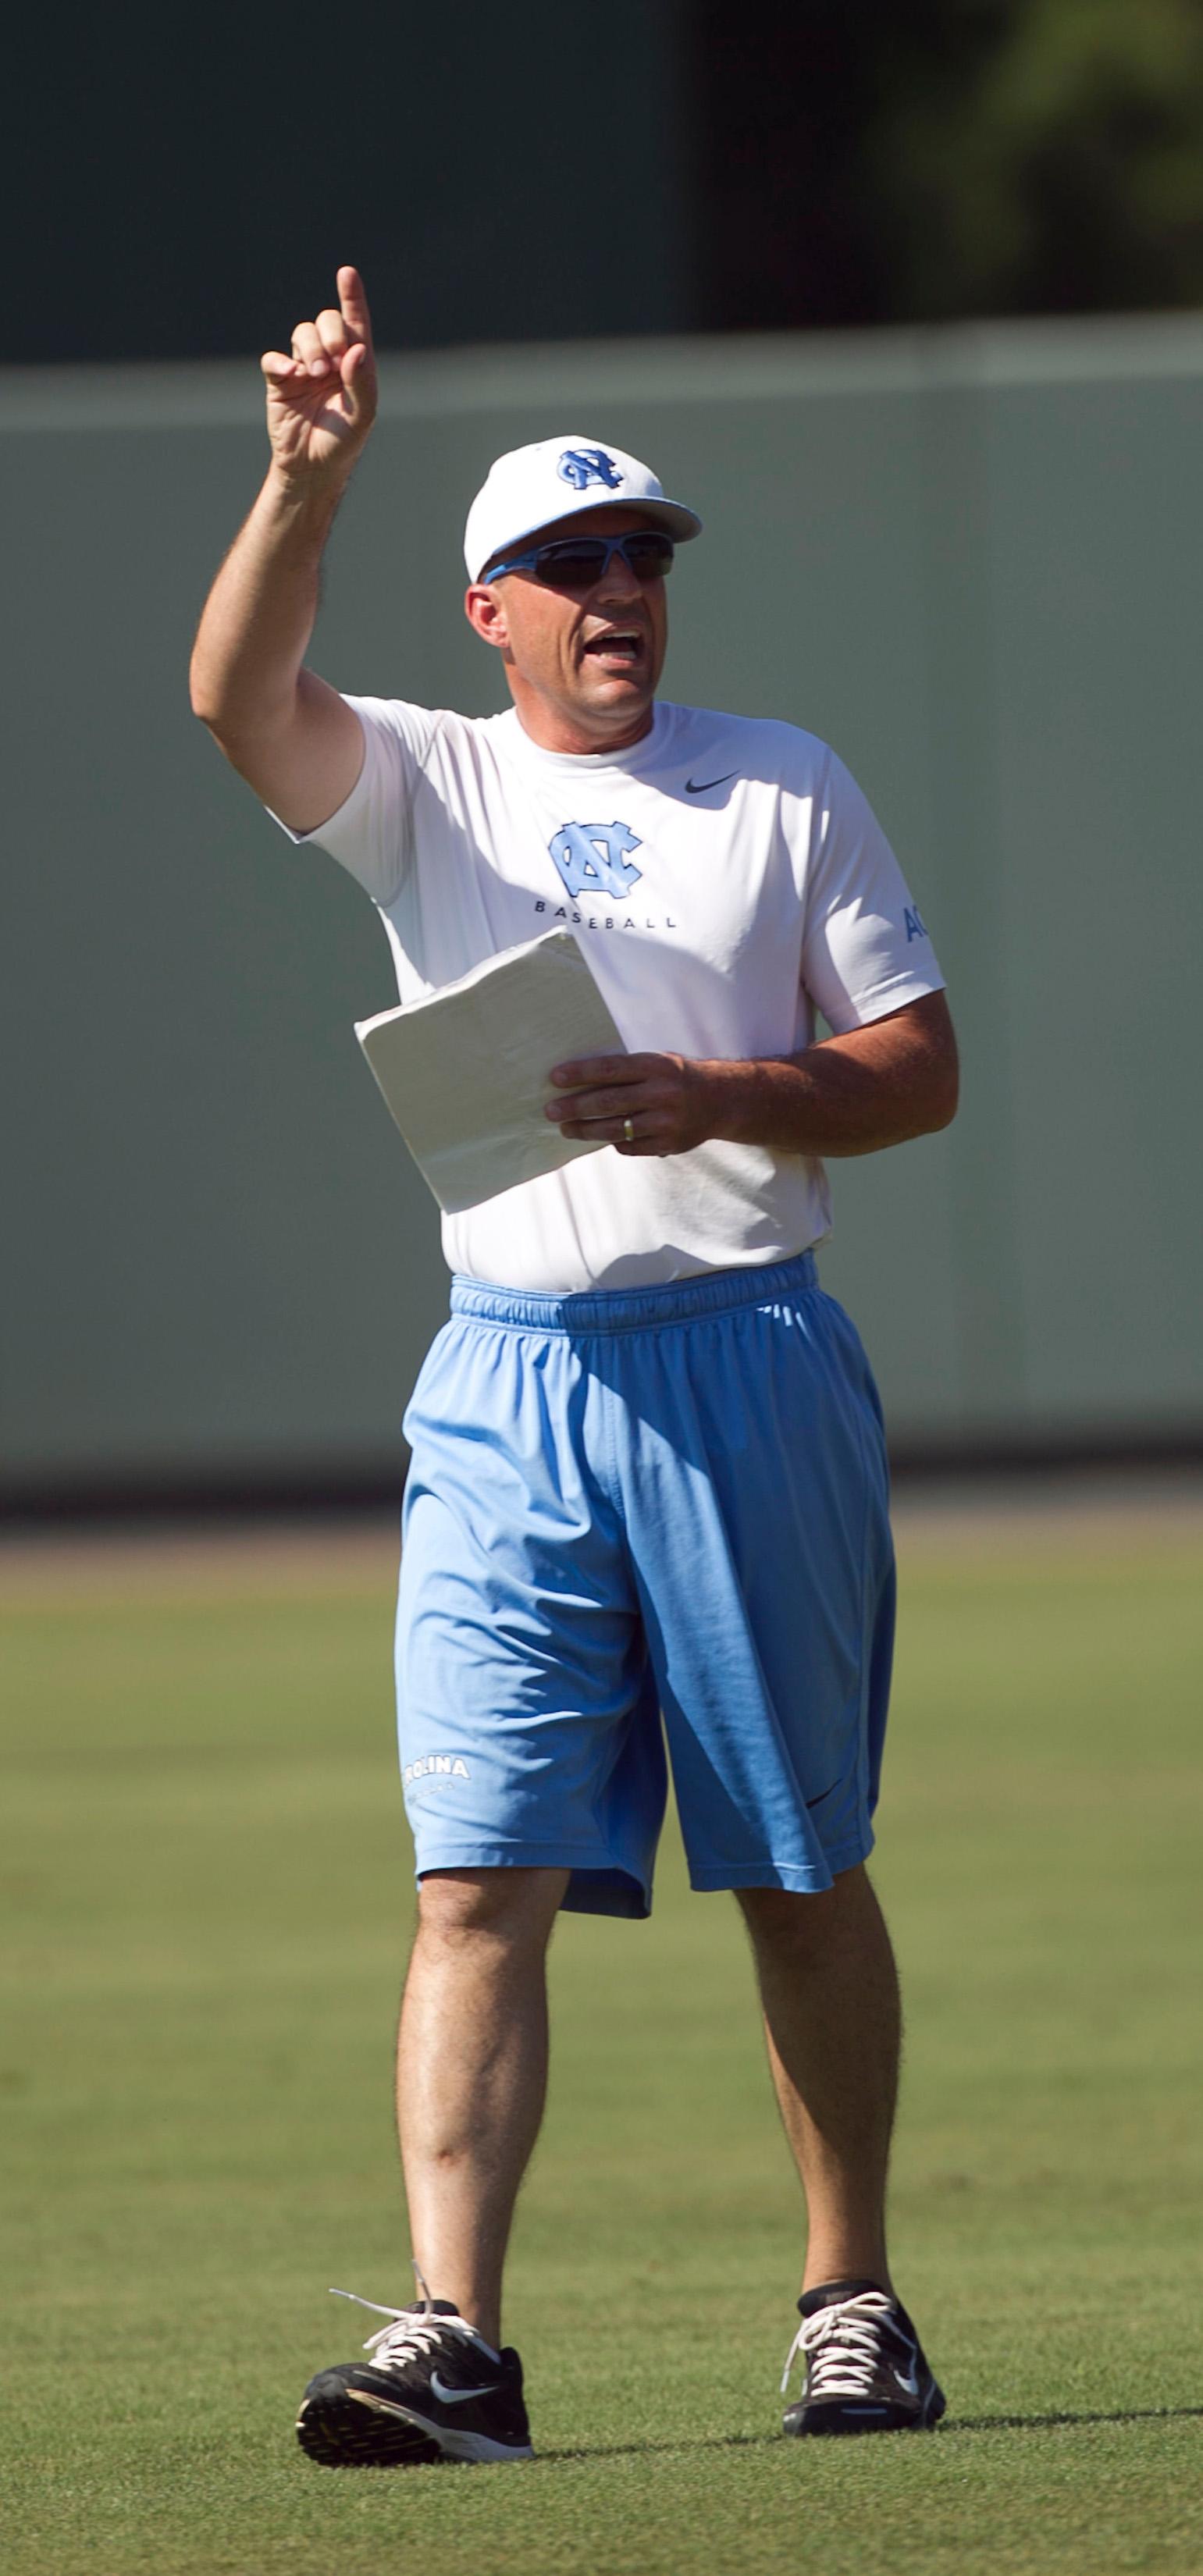 North Carolina Practice for NCAA Baseball